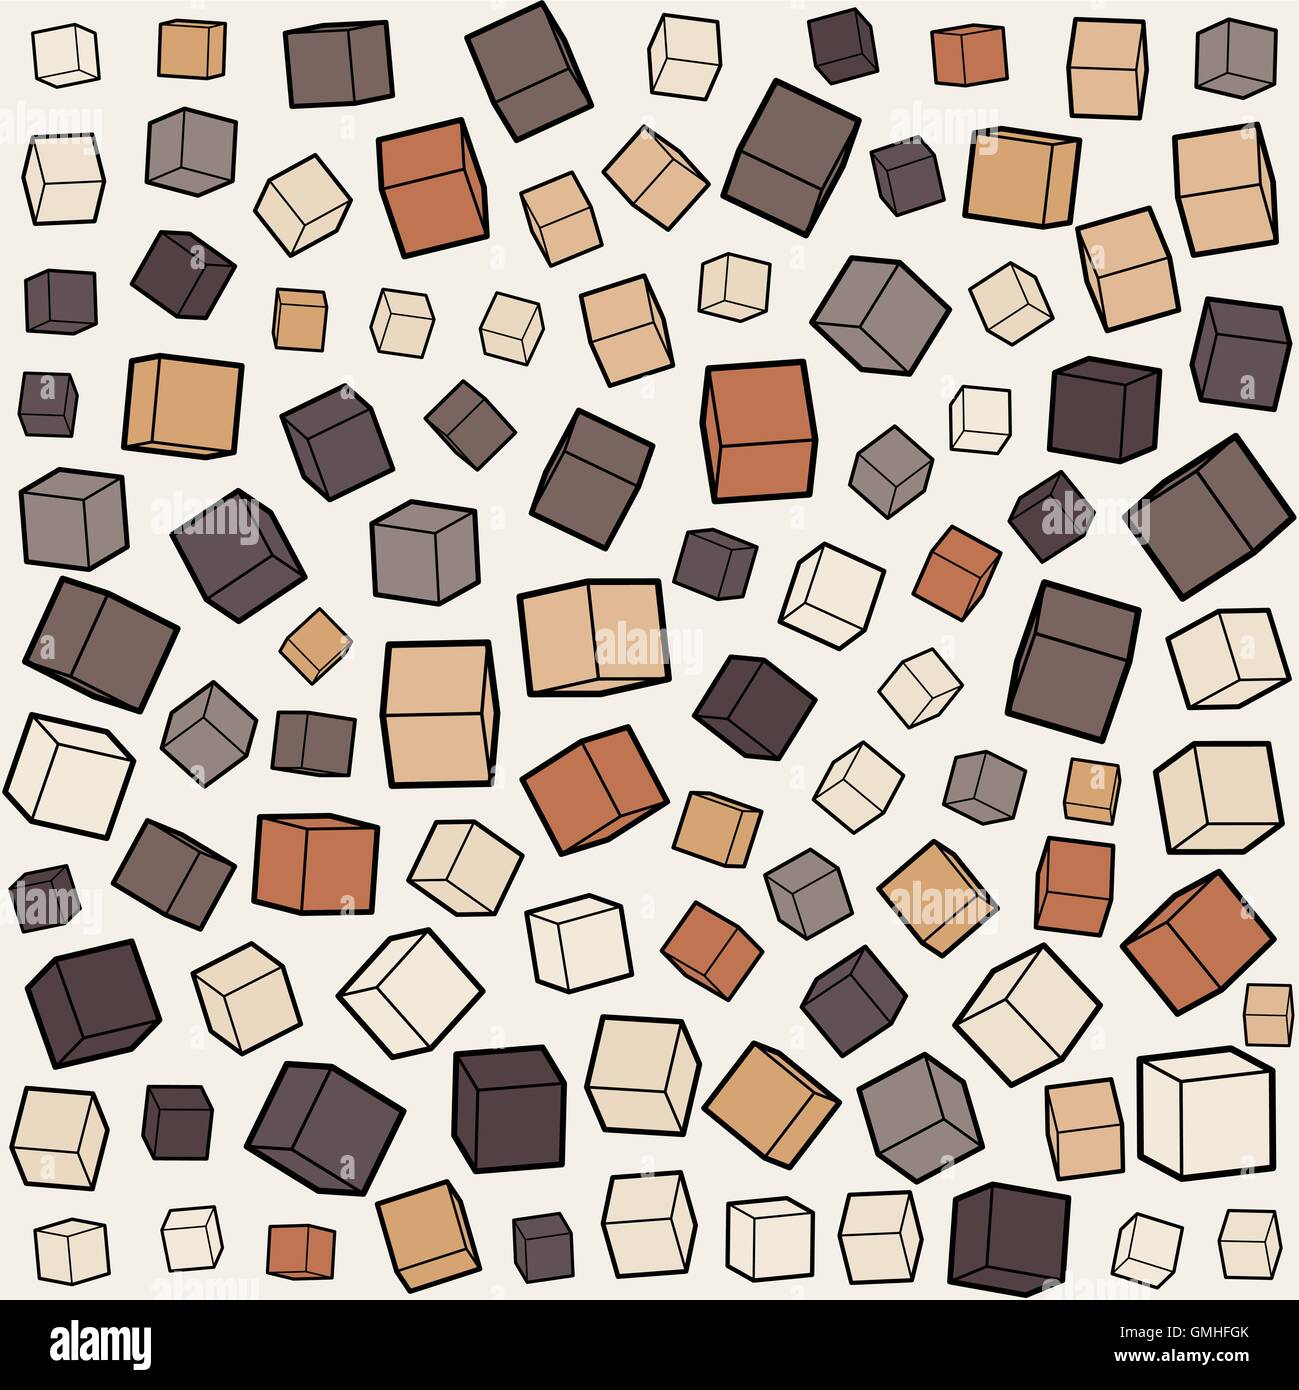 Vector Seamless Box Cube Random Scale Jumble Pattern - Stock Image